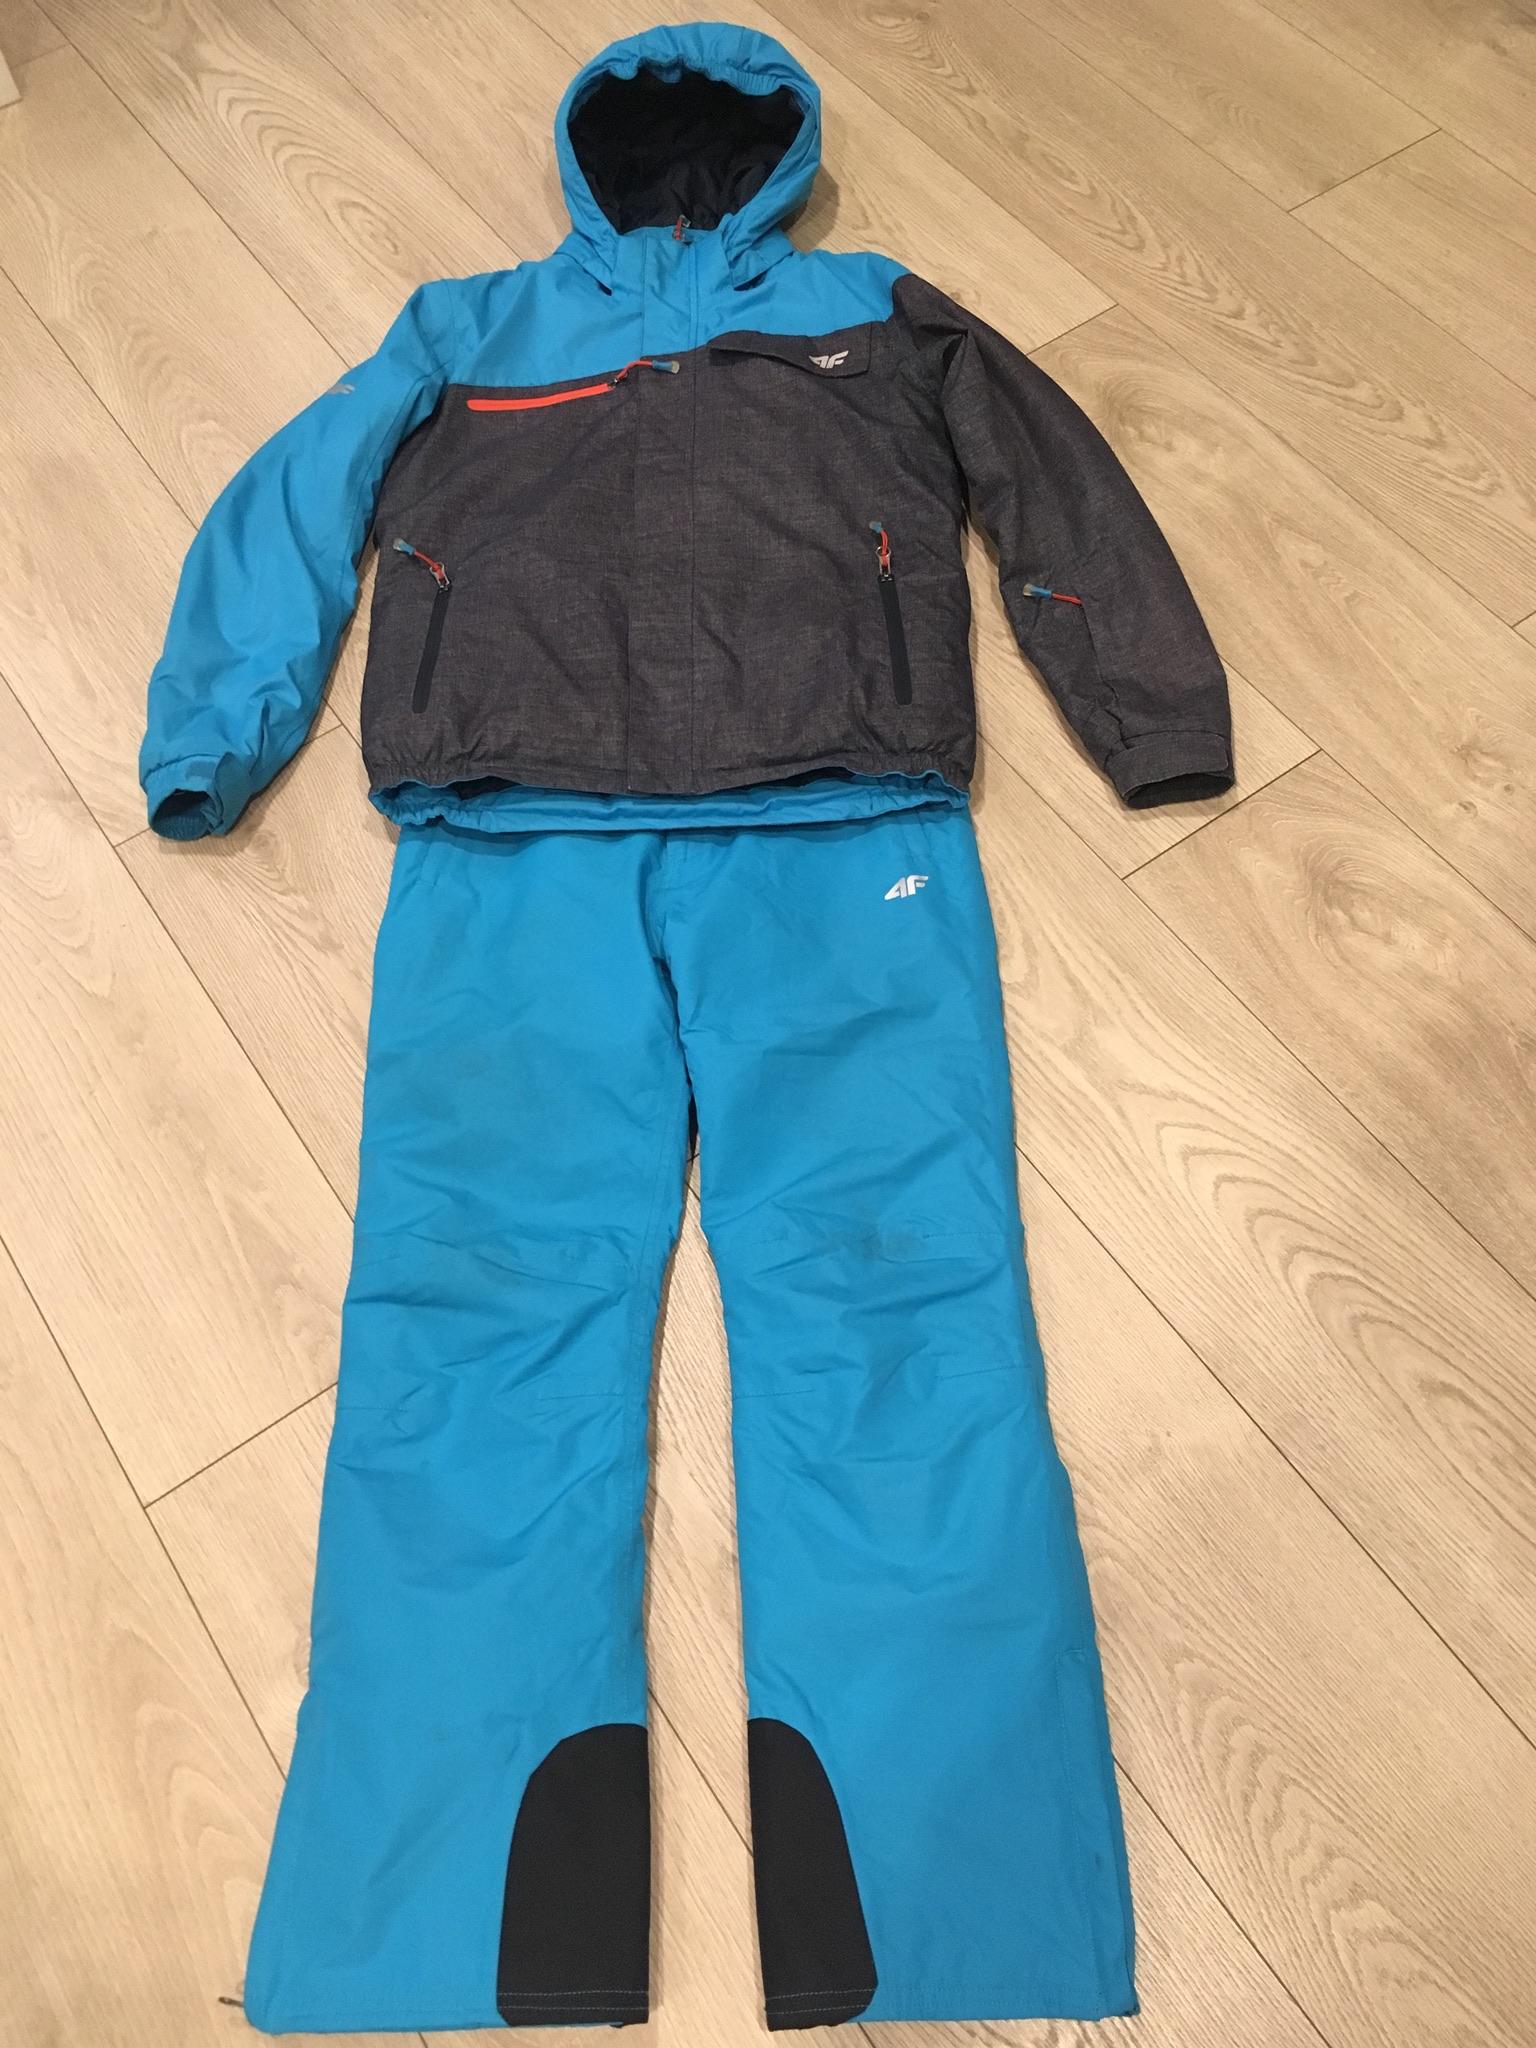 db67c734d 4F komplet narciarski kurtka + spodnie 152 cm - 7011224491 ...